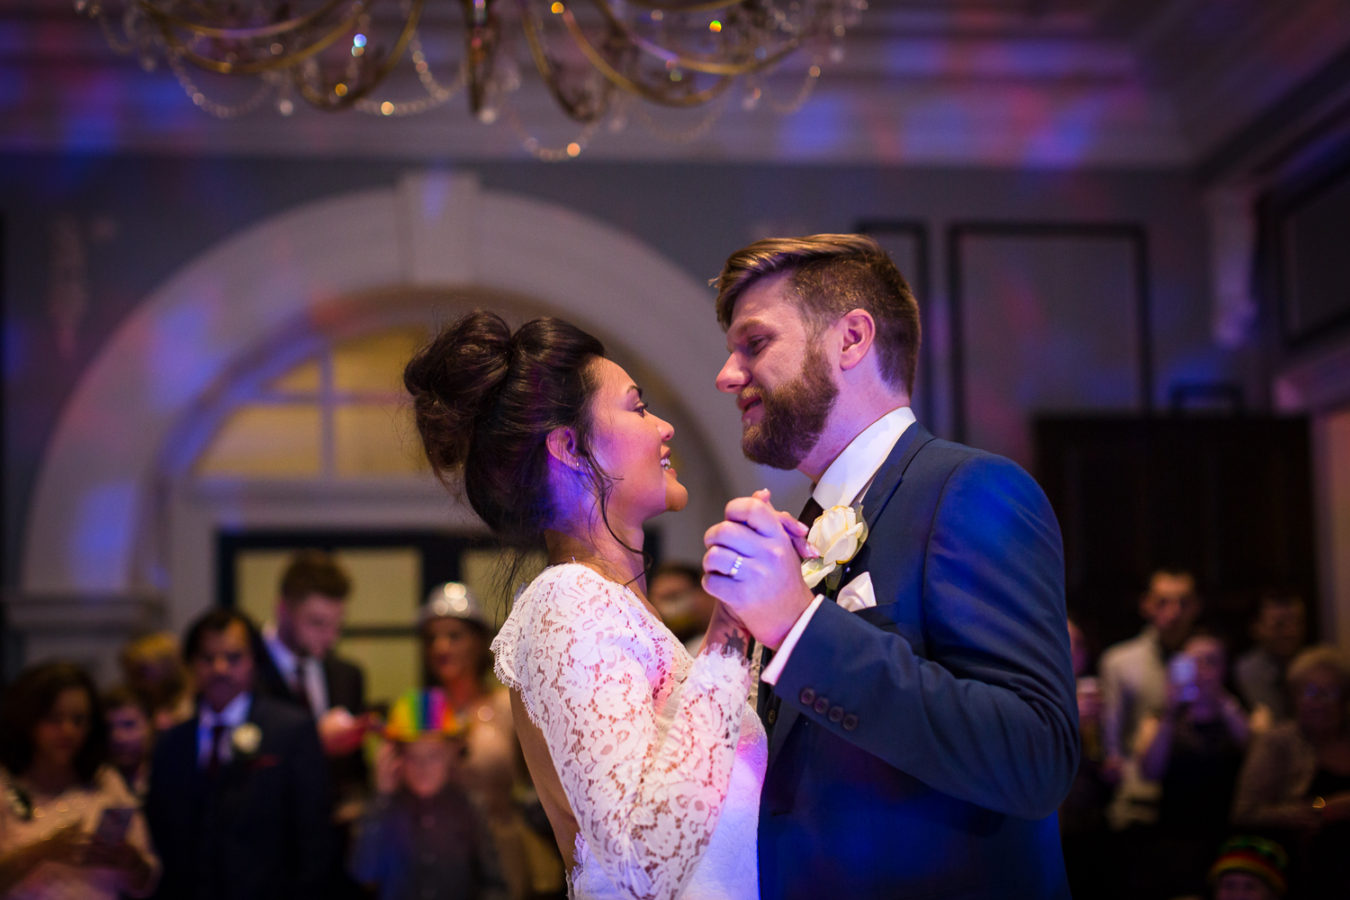 Oulton Hall wedding photographer Amanda Manby photography